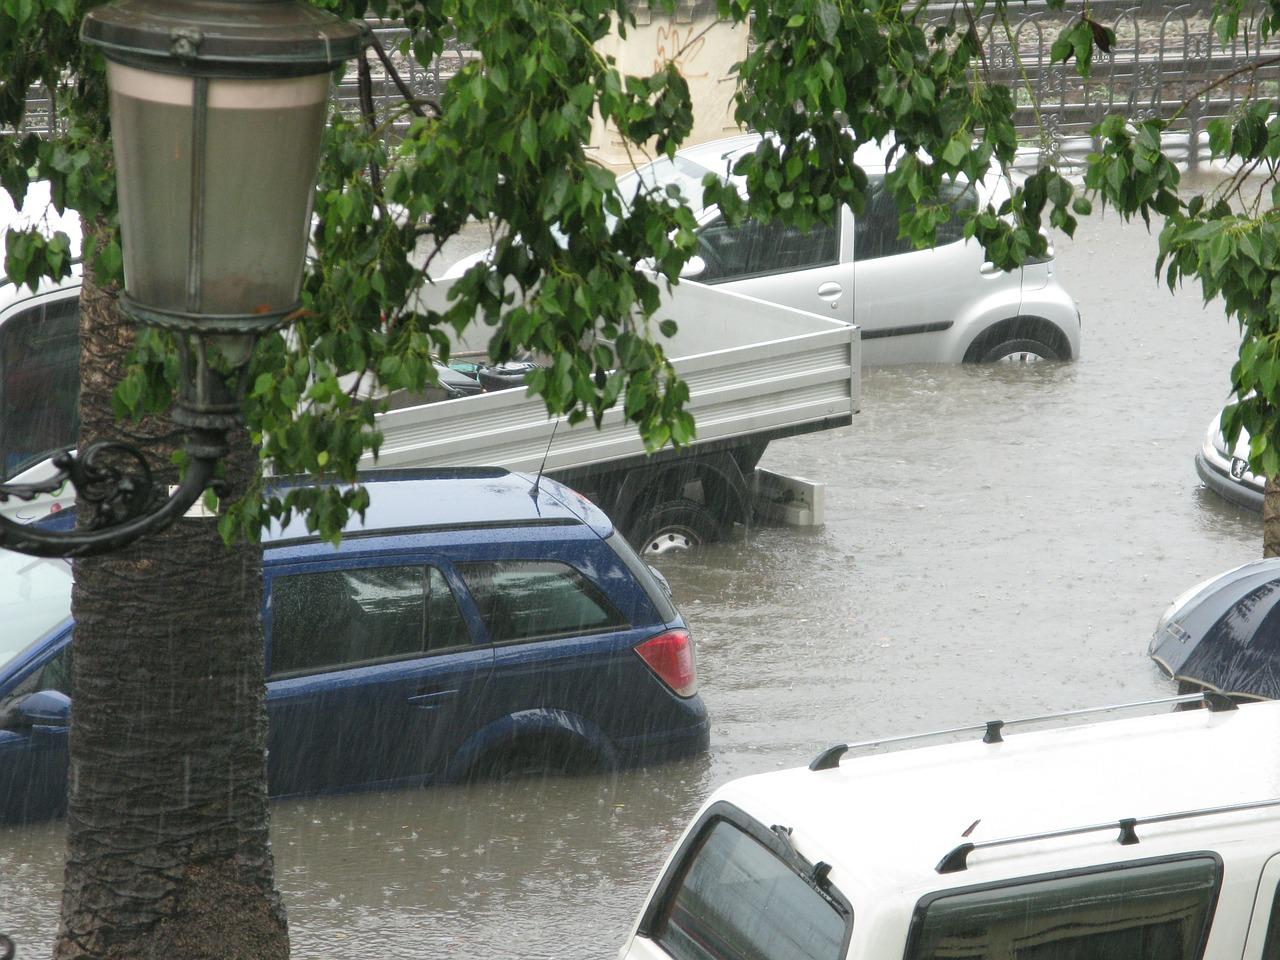 flood-58029_1280